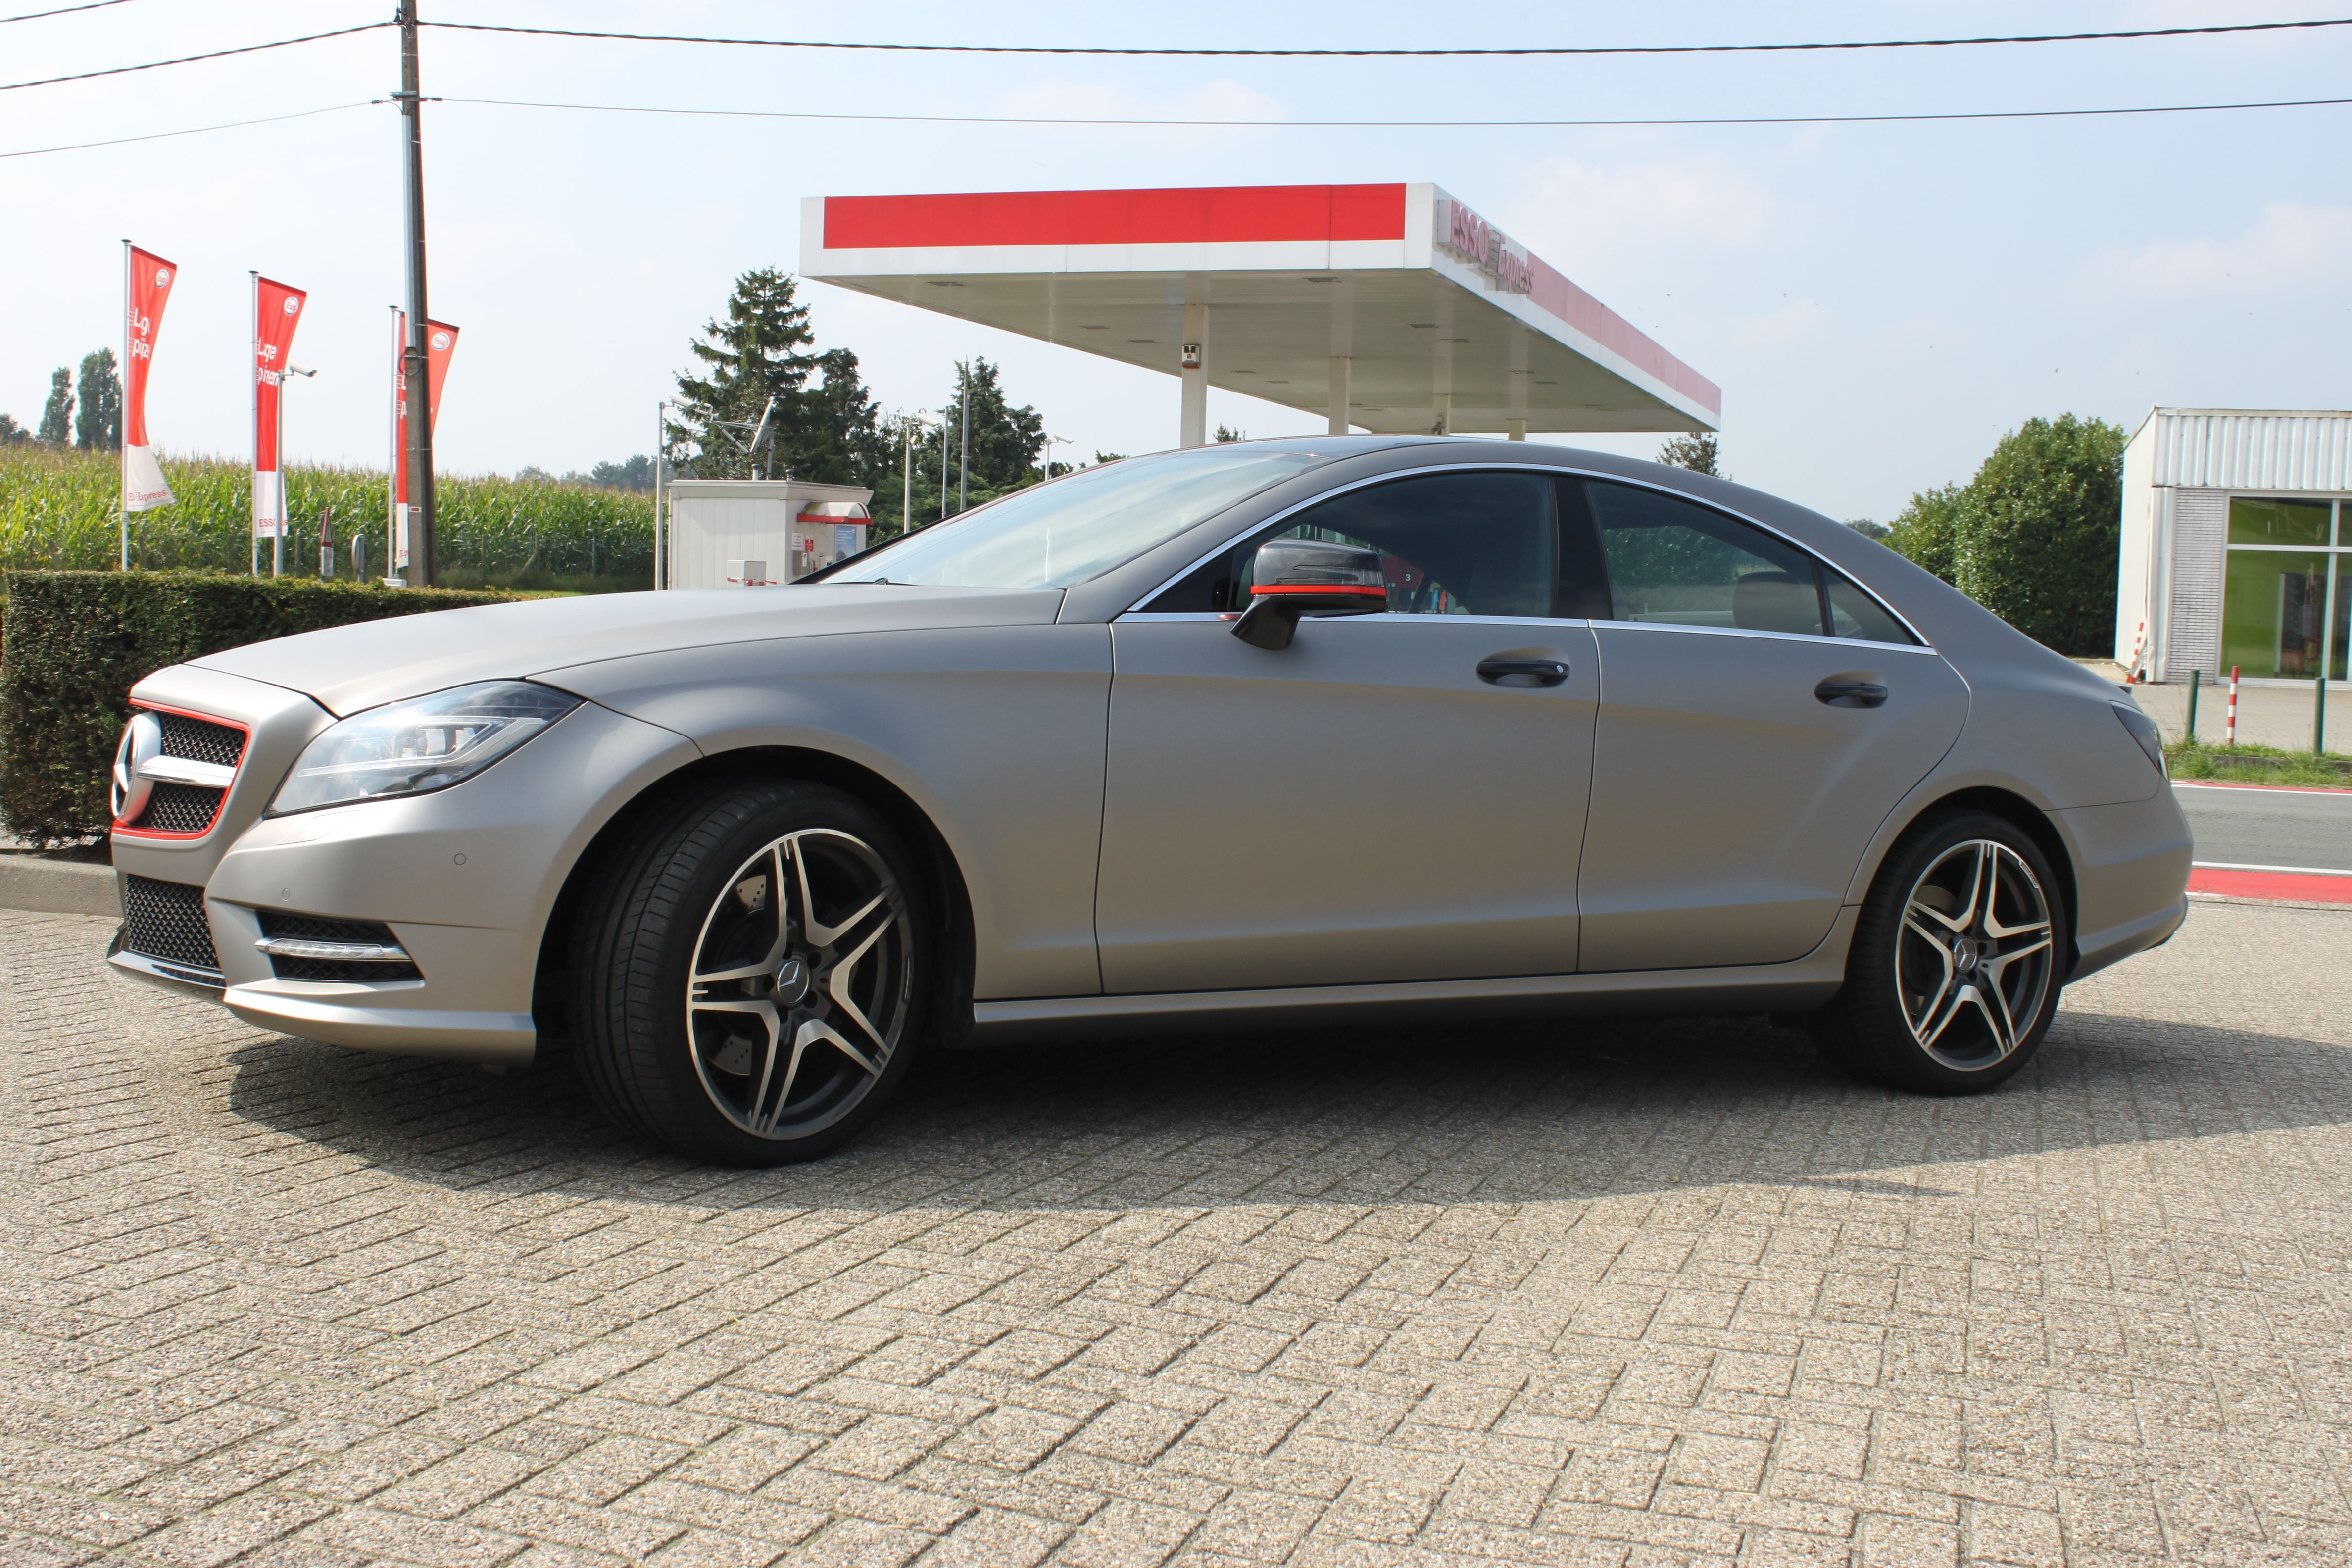 Mercedes CLS met Mat Grey Aluminium Wrap, Carwrapping door Wrapmyride.nu Foto-nr:6161, ©2020